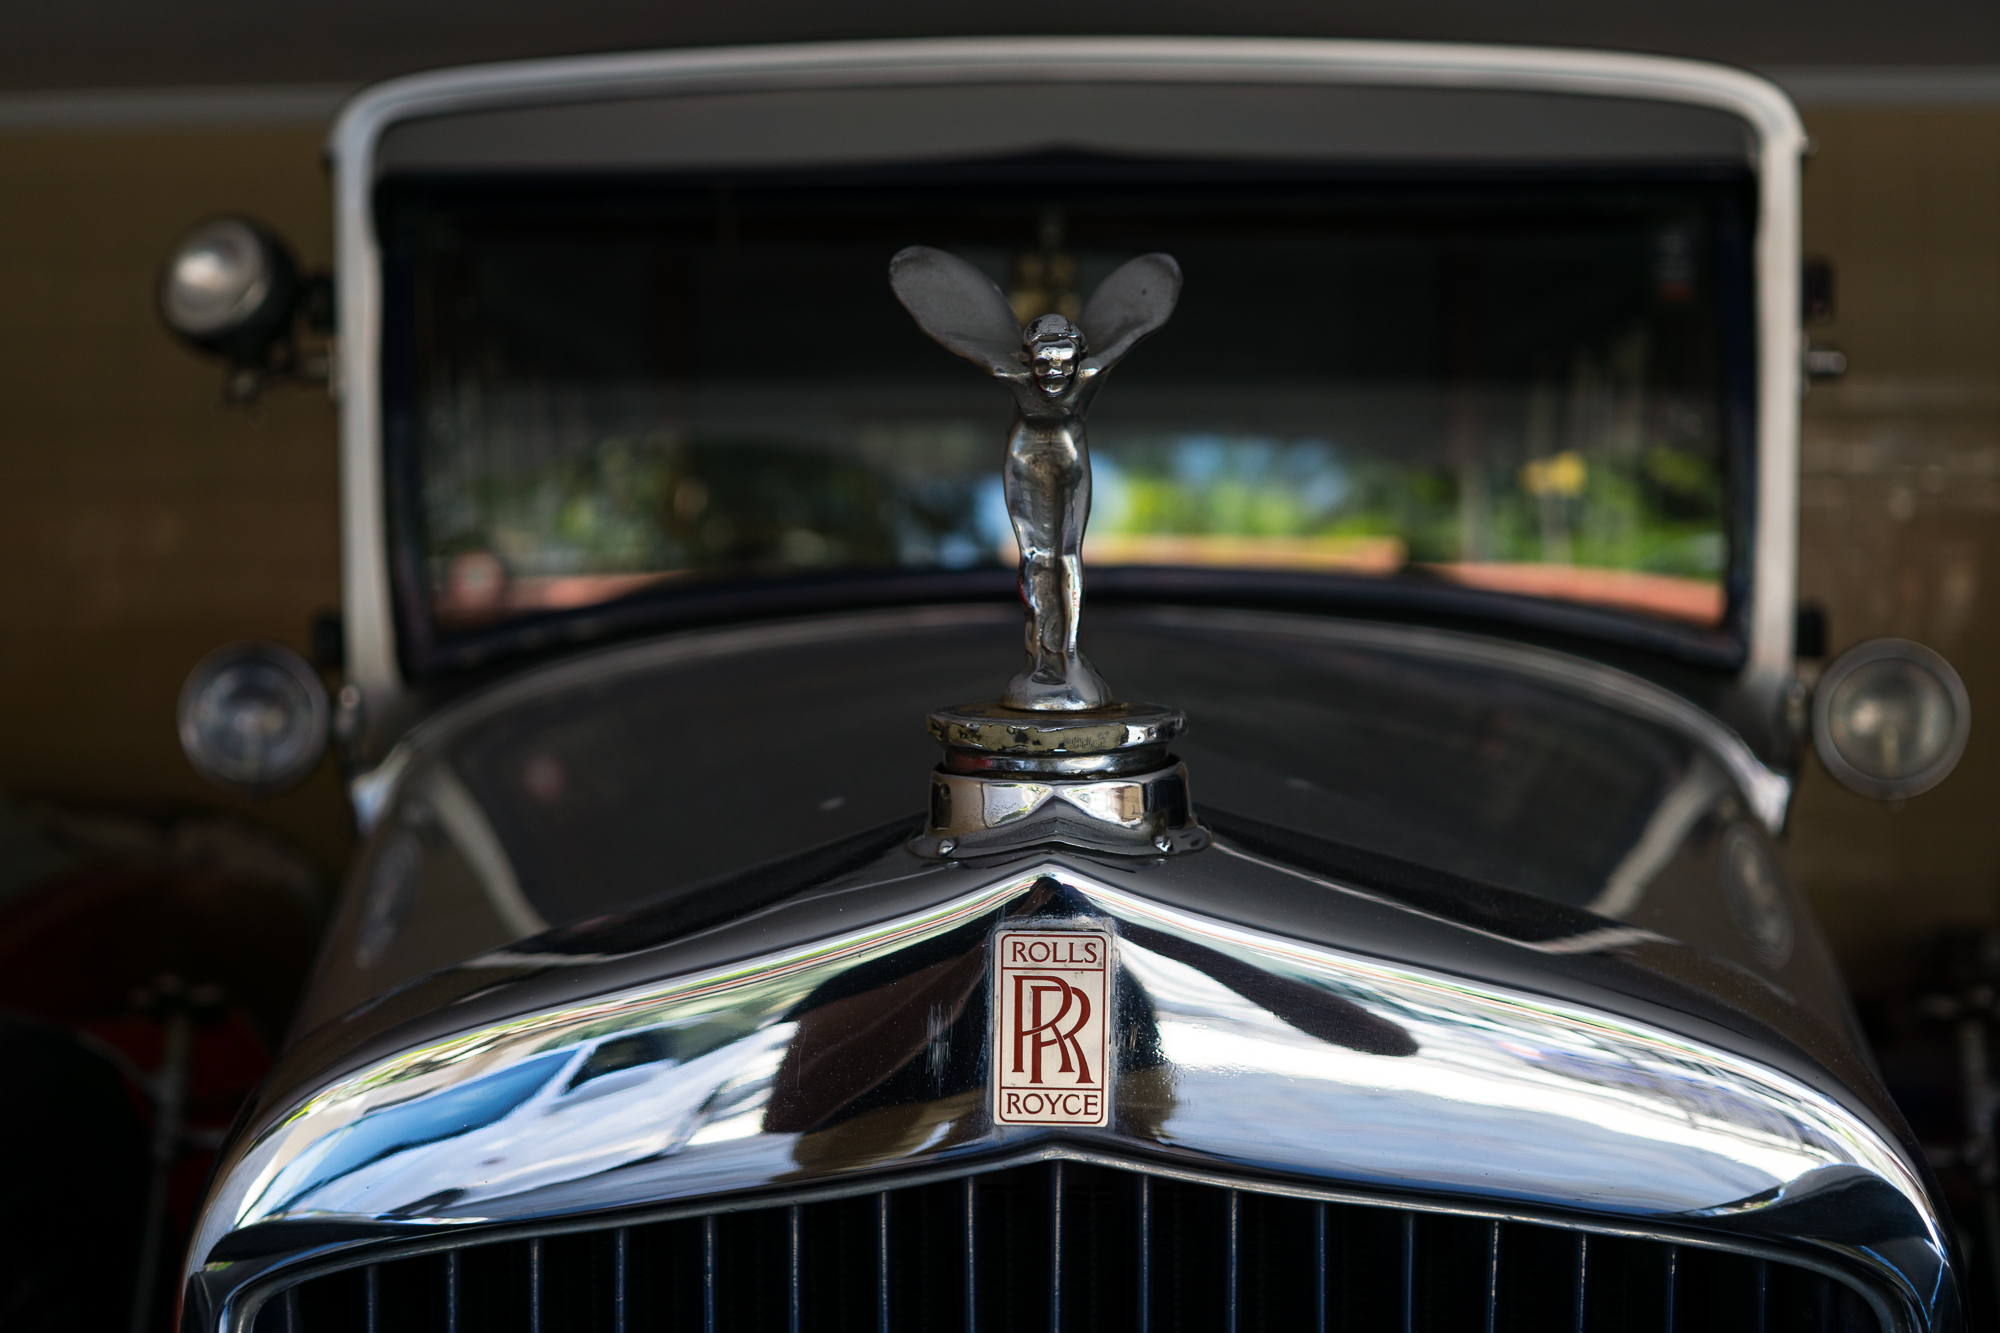 Rolls Royce Angel hood ornament